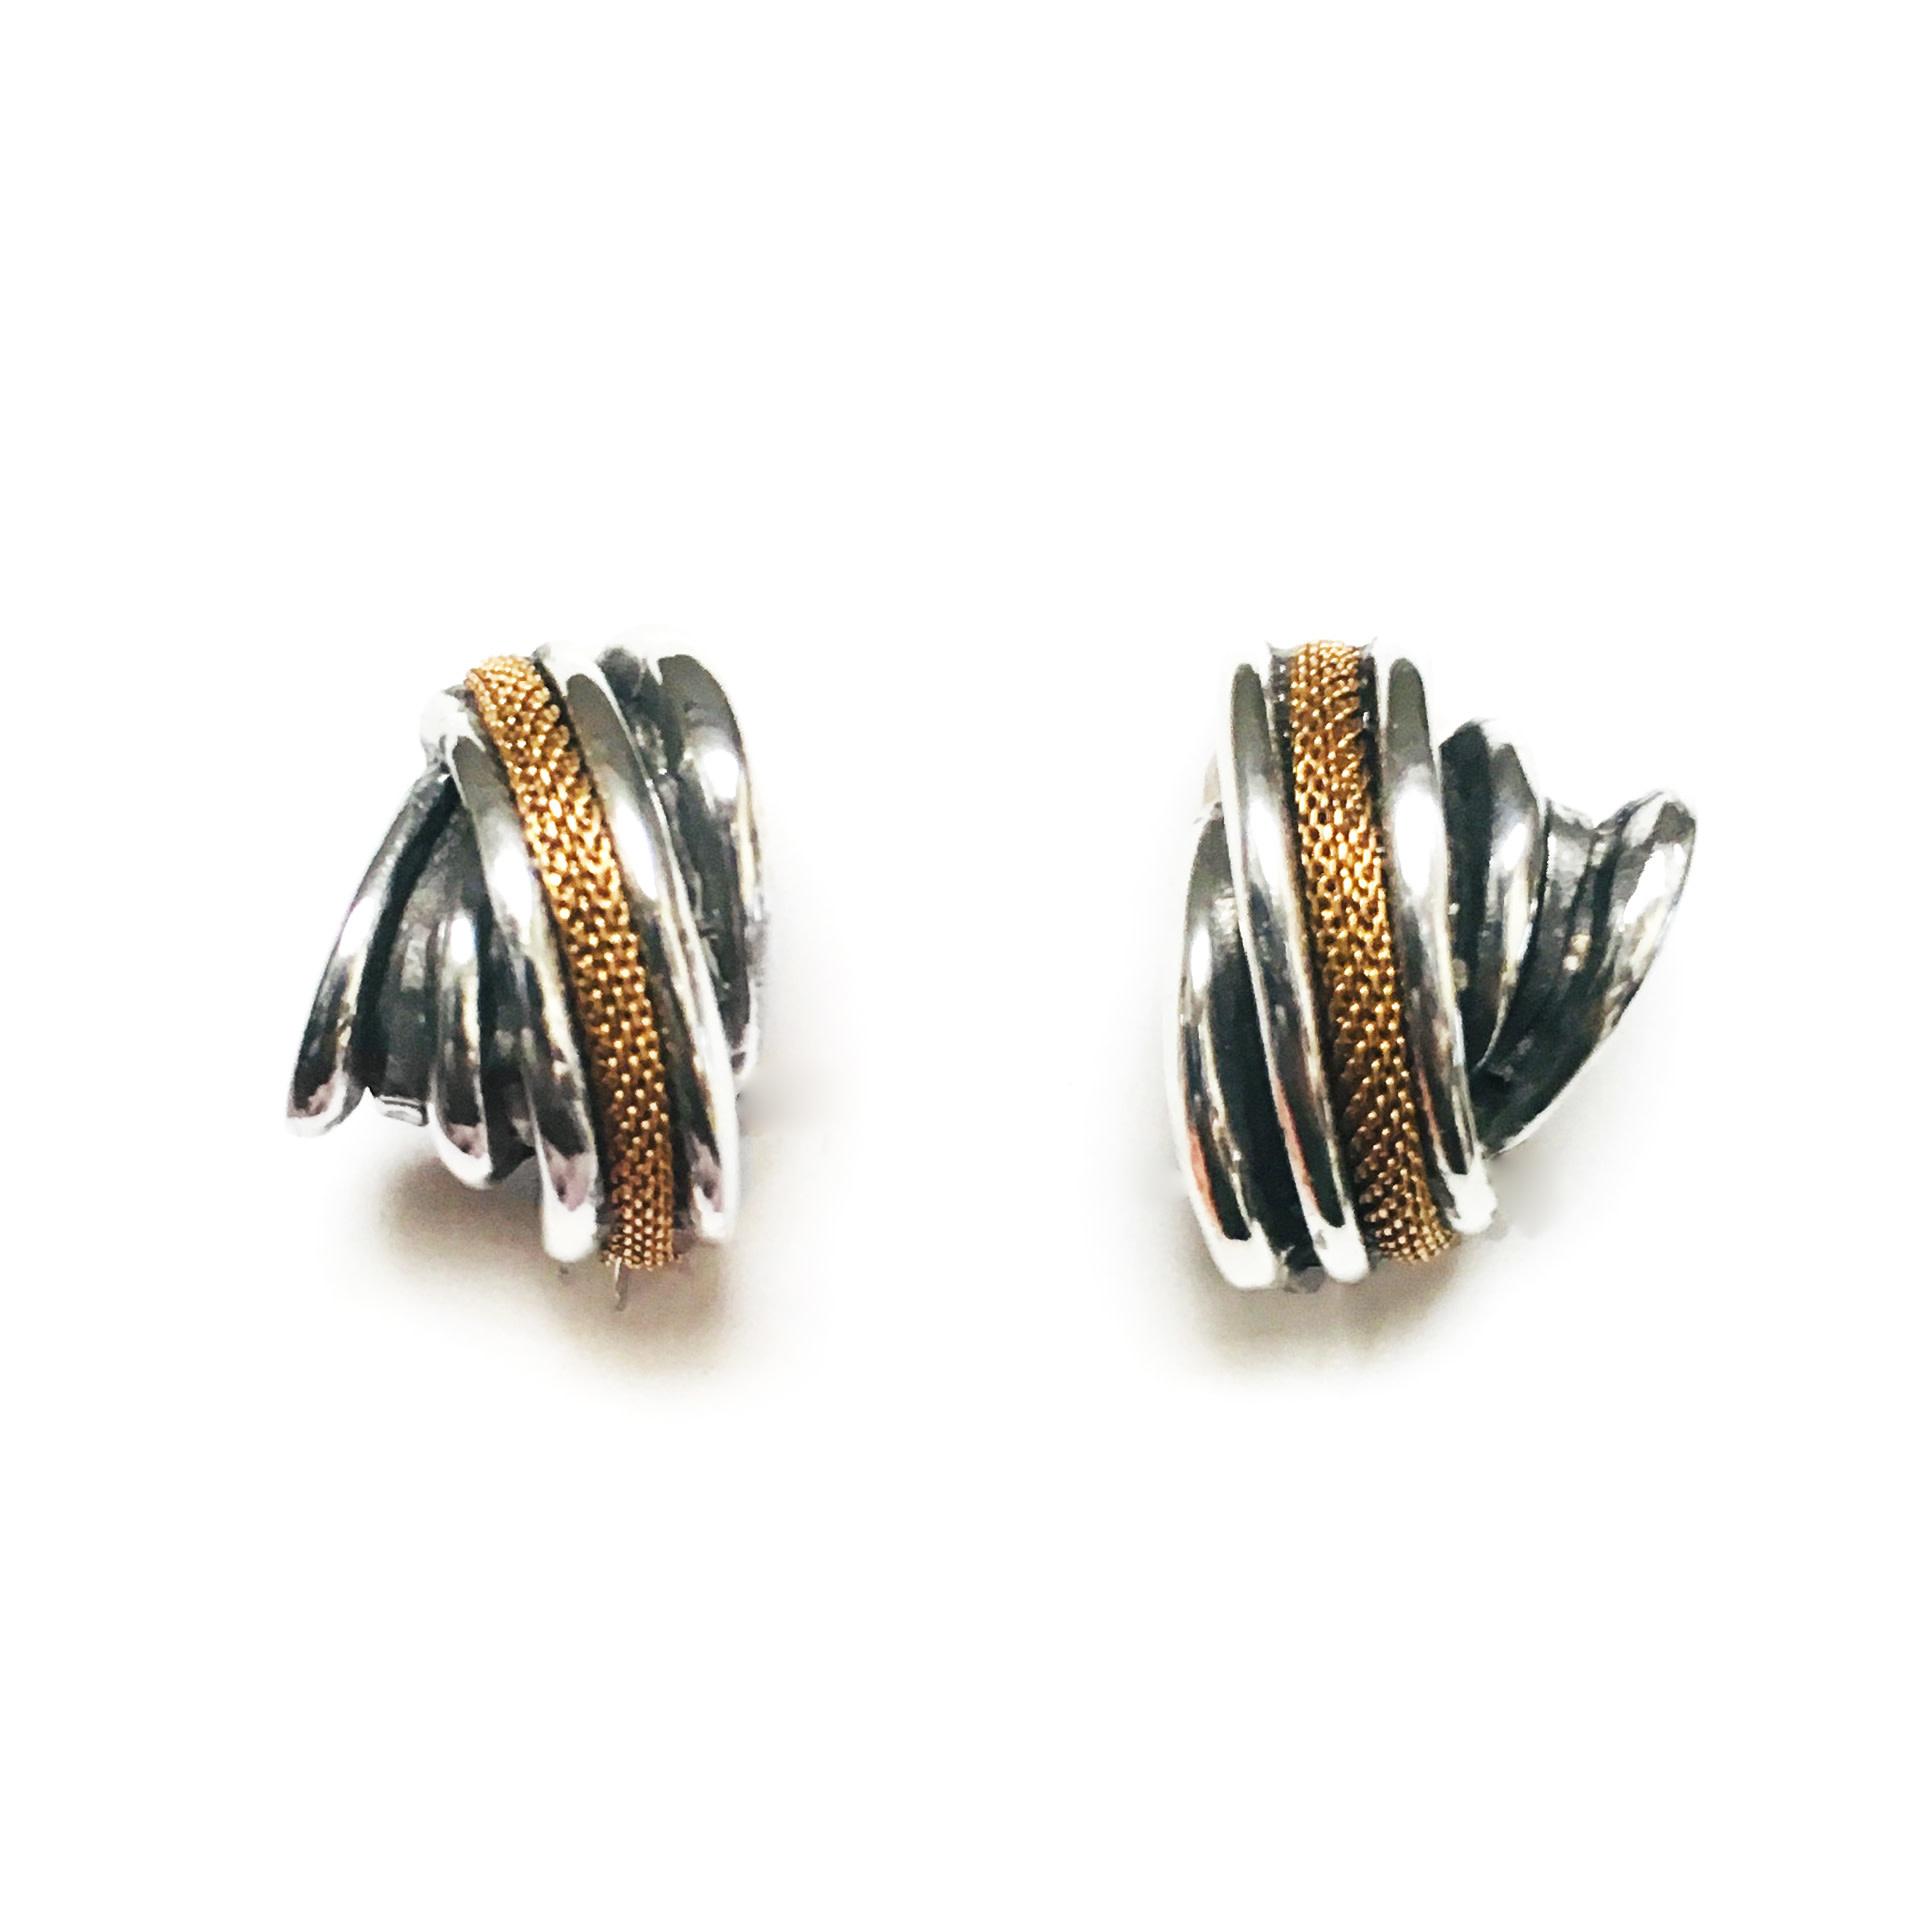 Fahrenheit Fahrenheit Grate Earrings